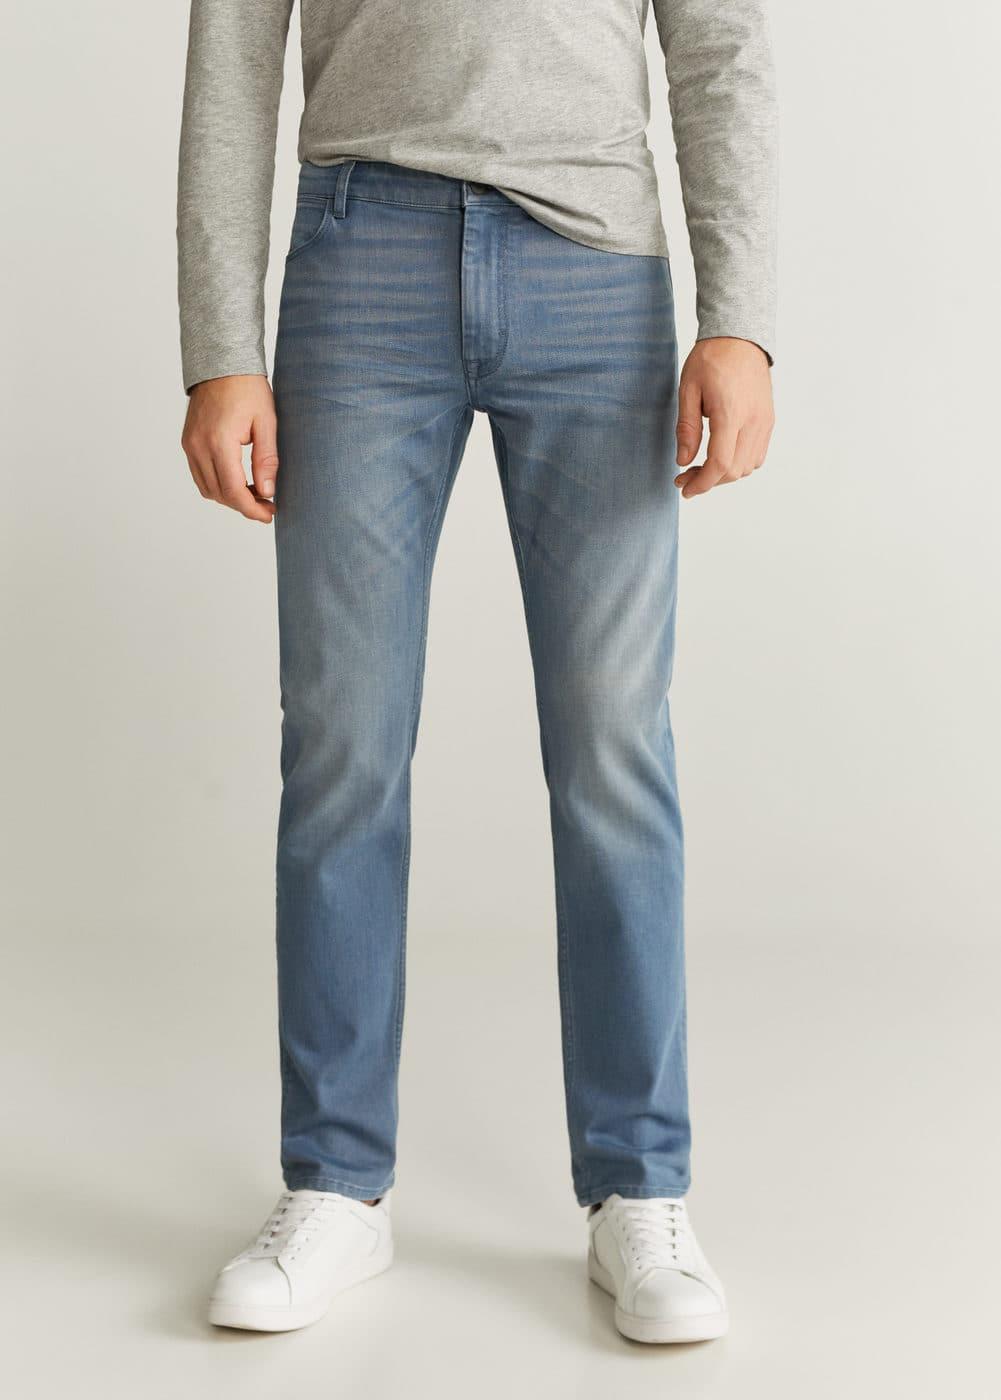 h-patrick6:jeans patrick slim fit lavado medio